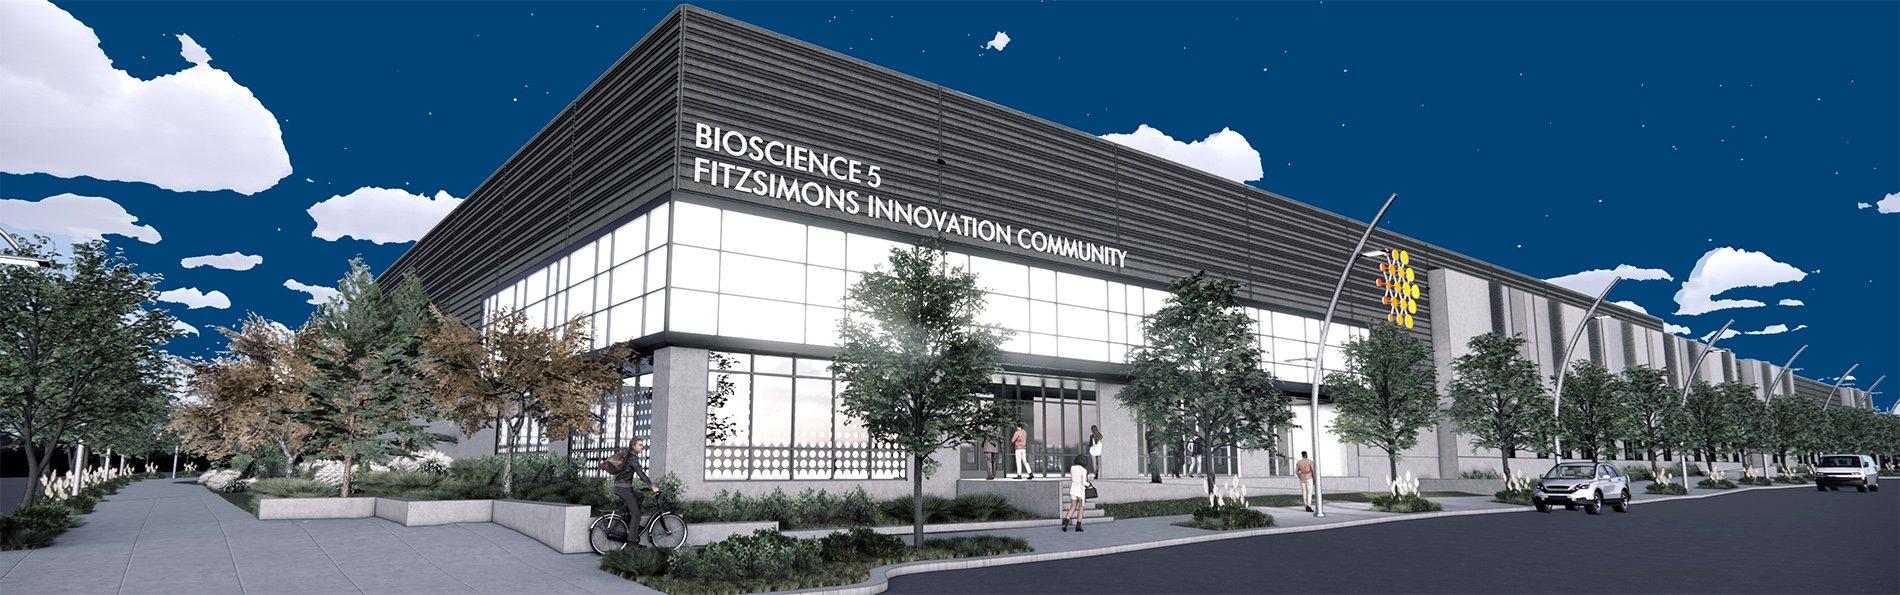 Rendition of  Bioscience building